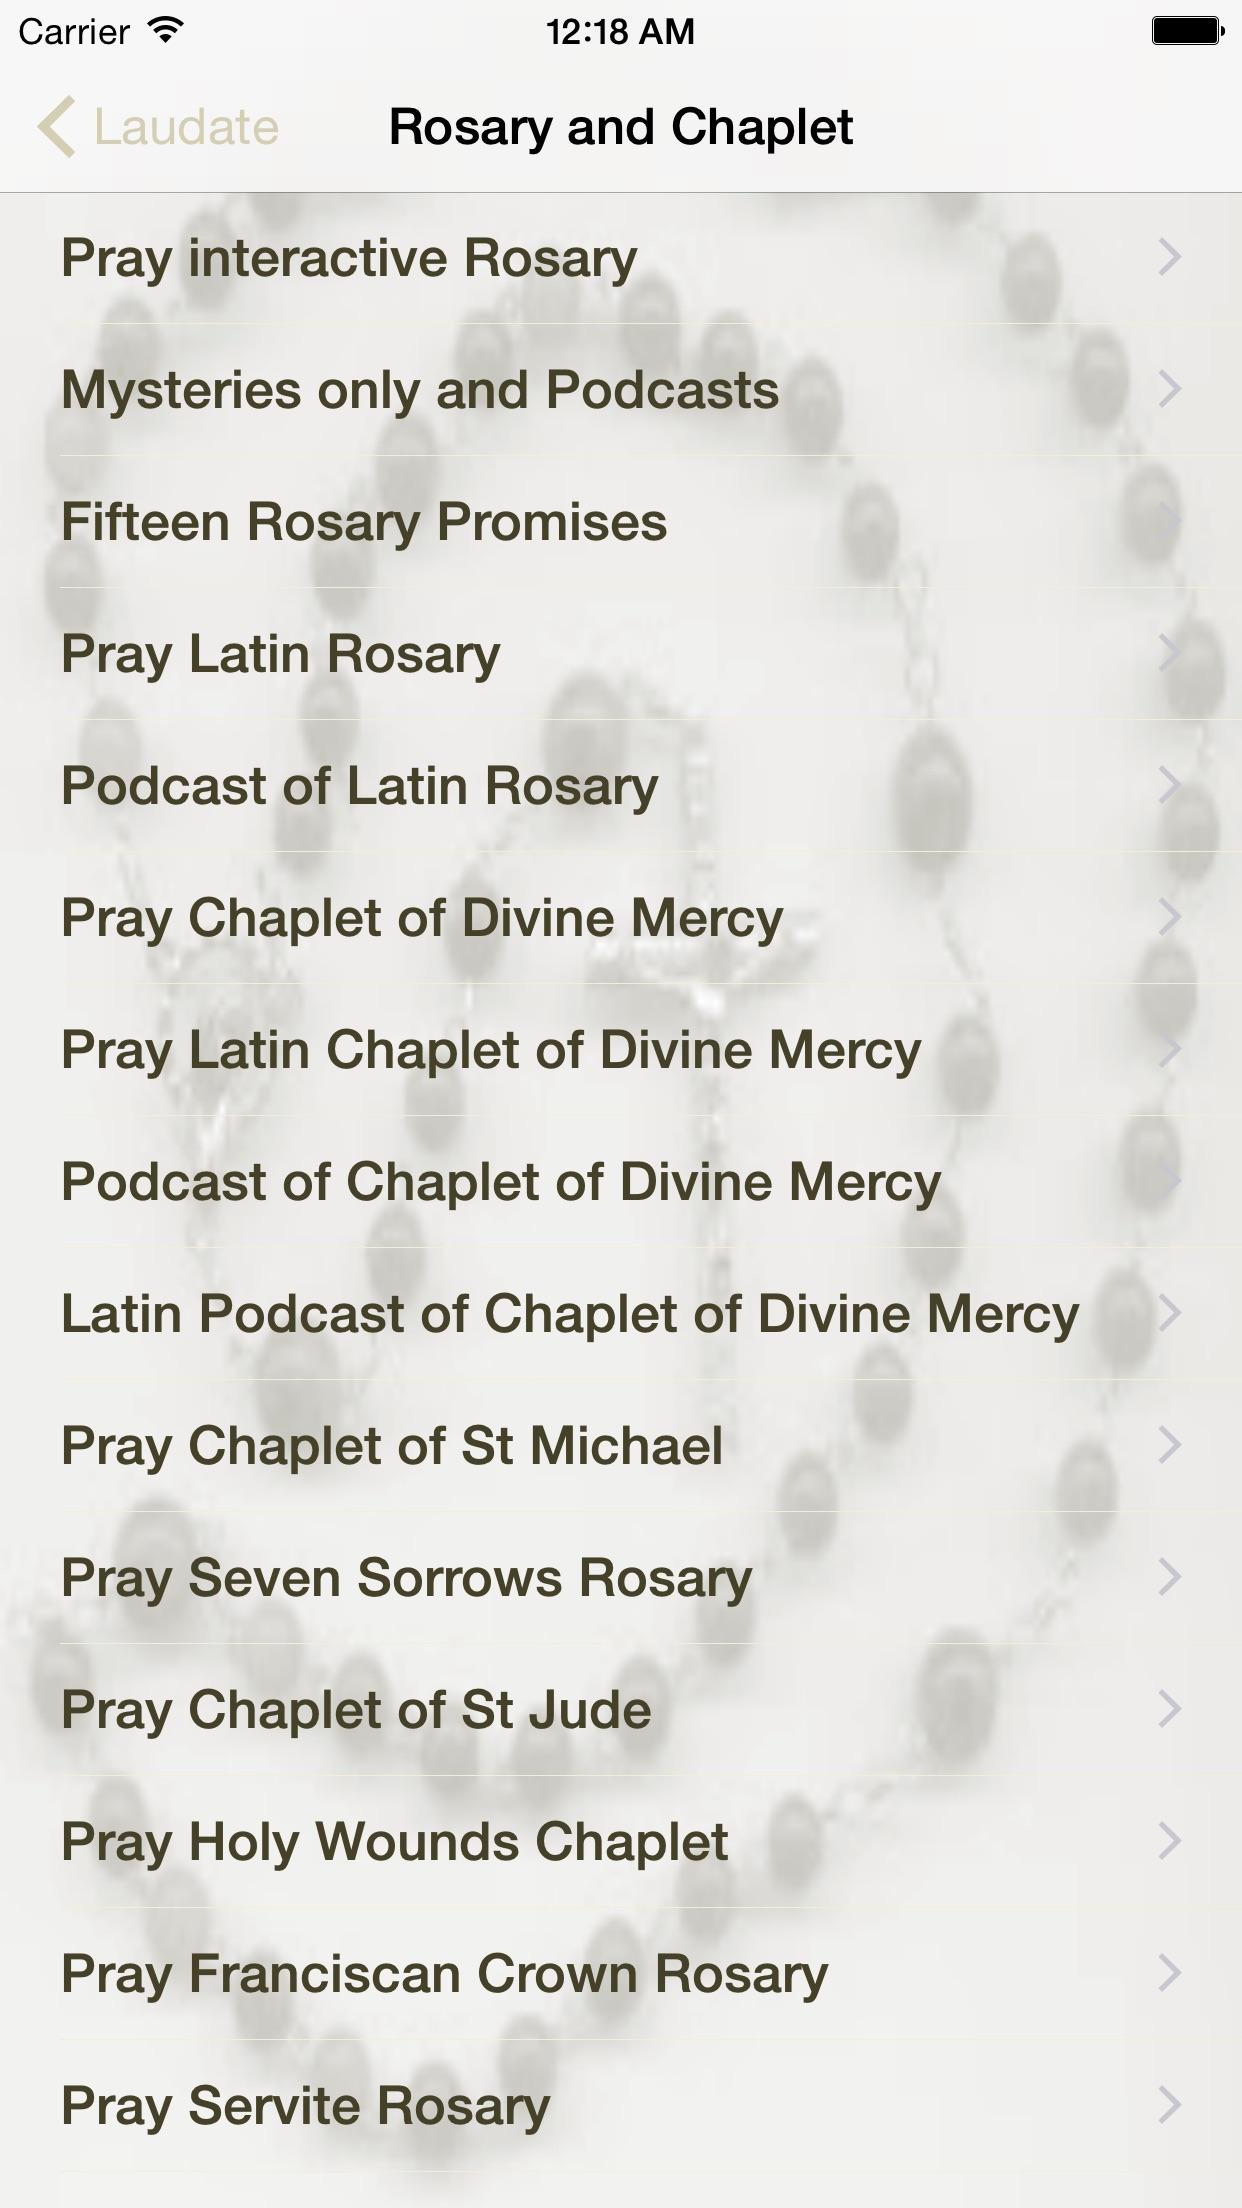 Laudate - #1 Catholic App Screenshot